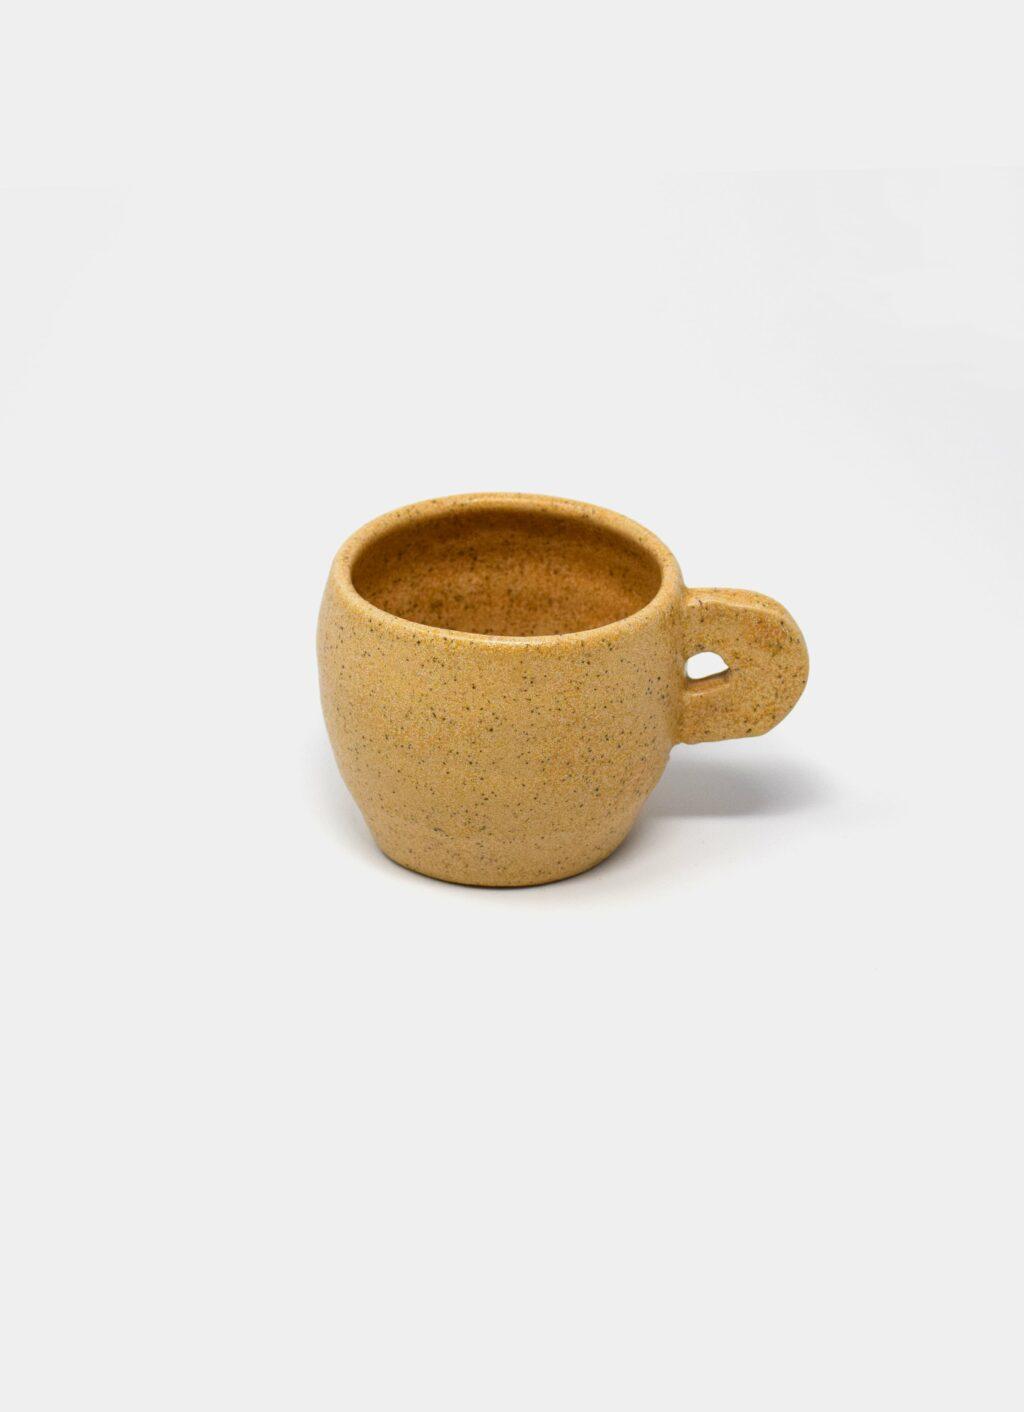 Kuza - Coffee Cup - Ochre